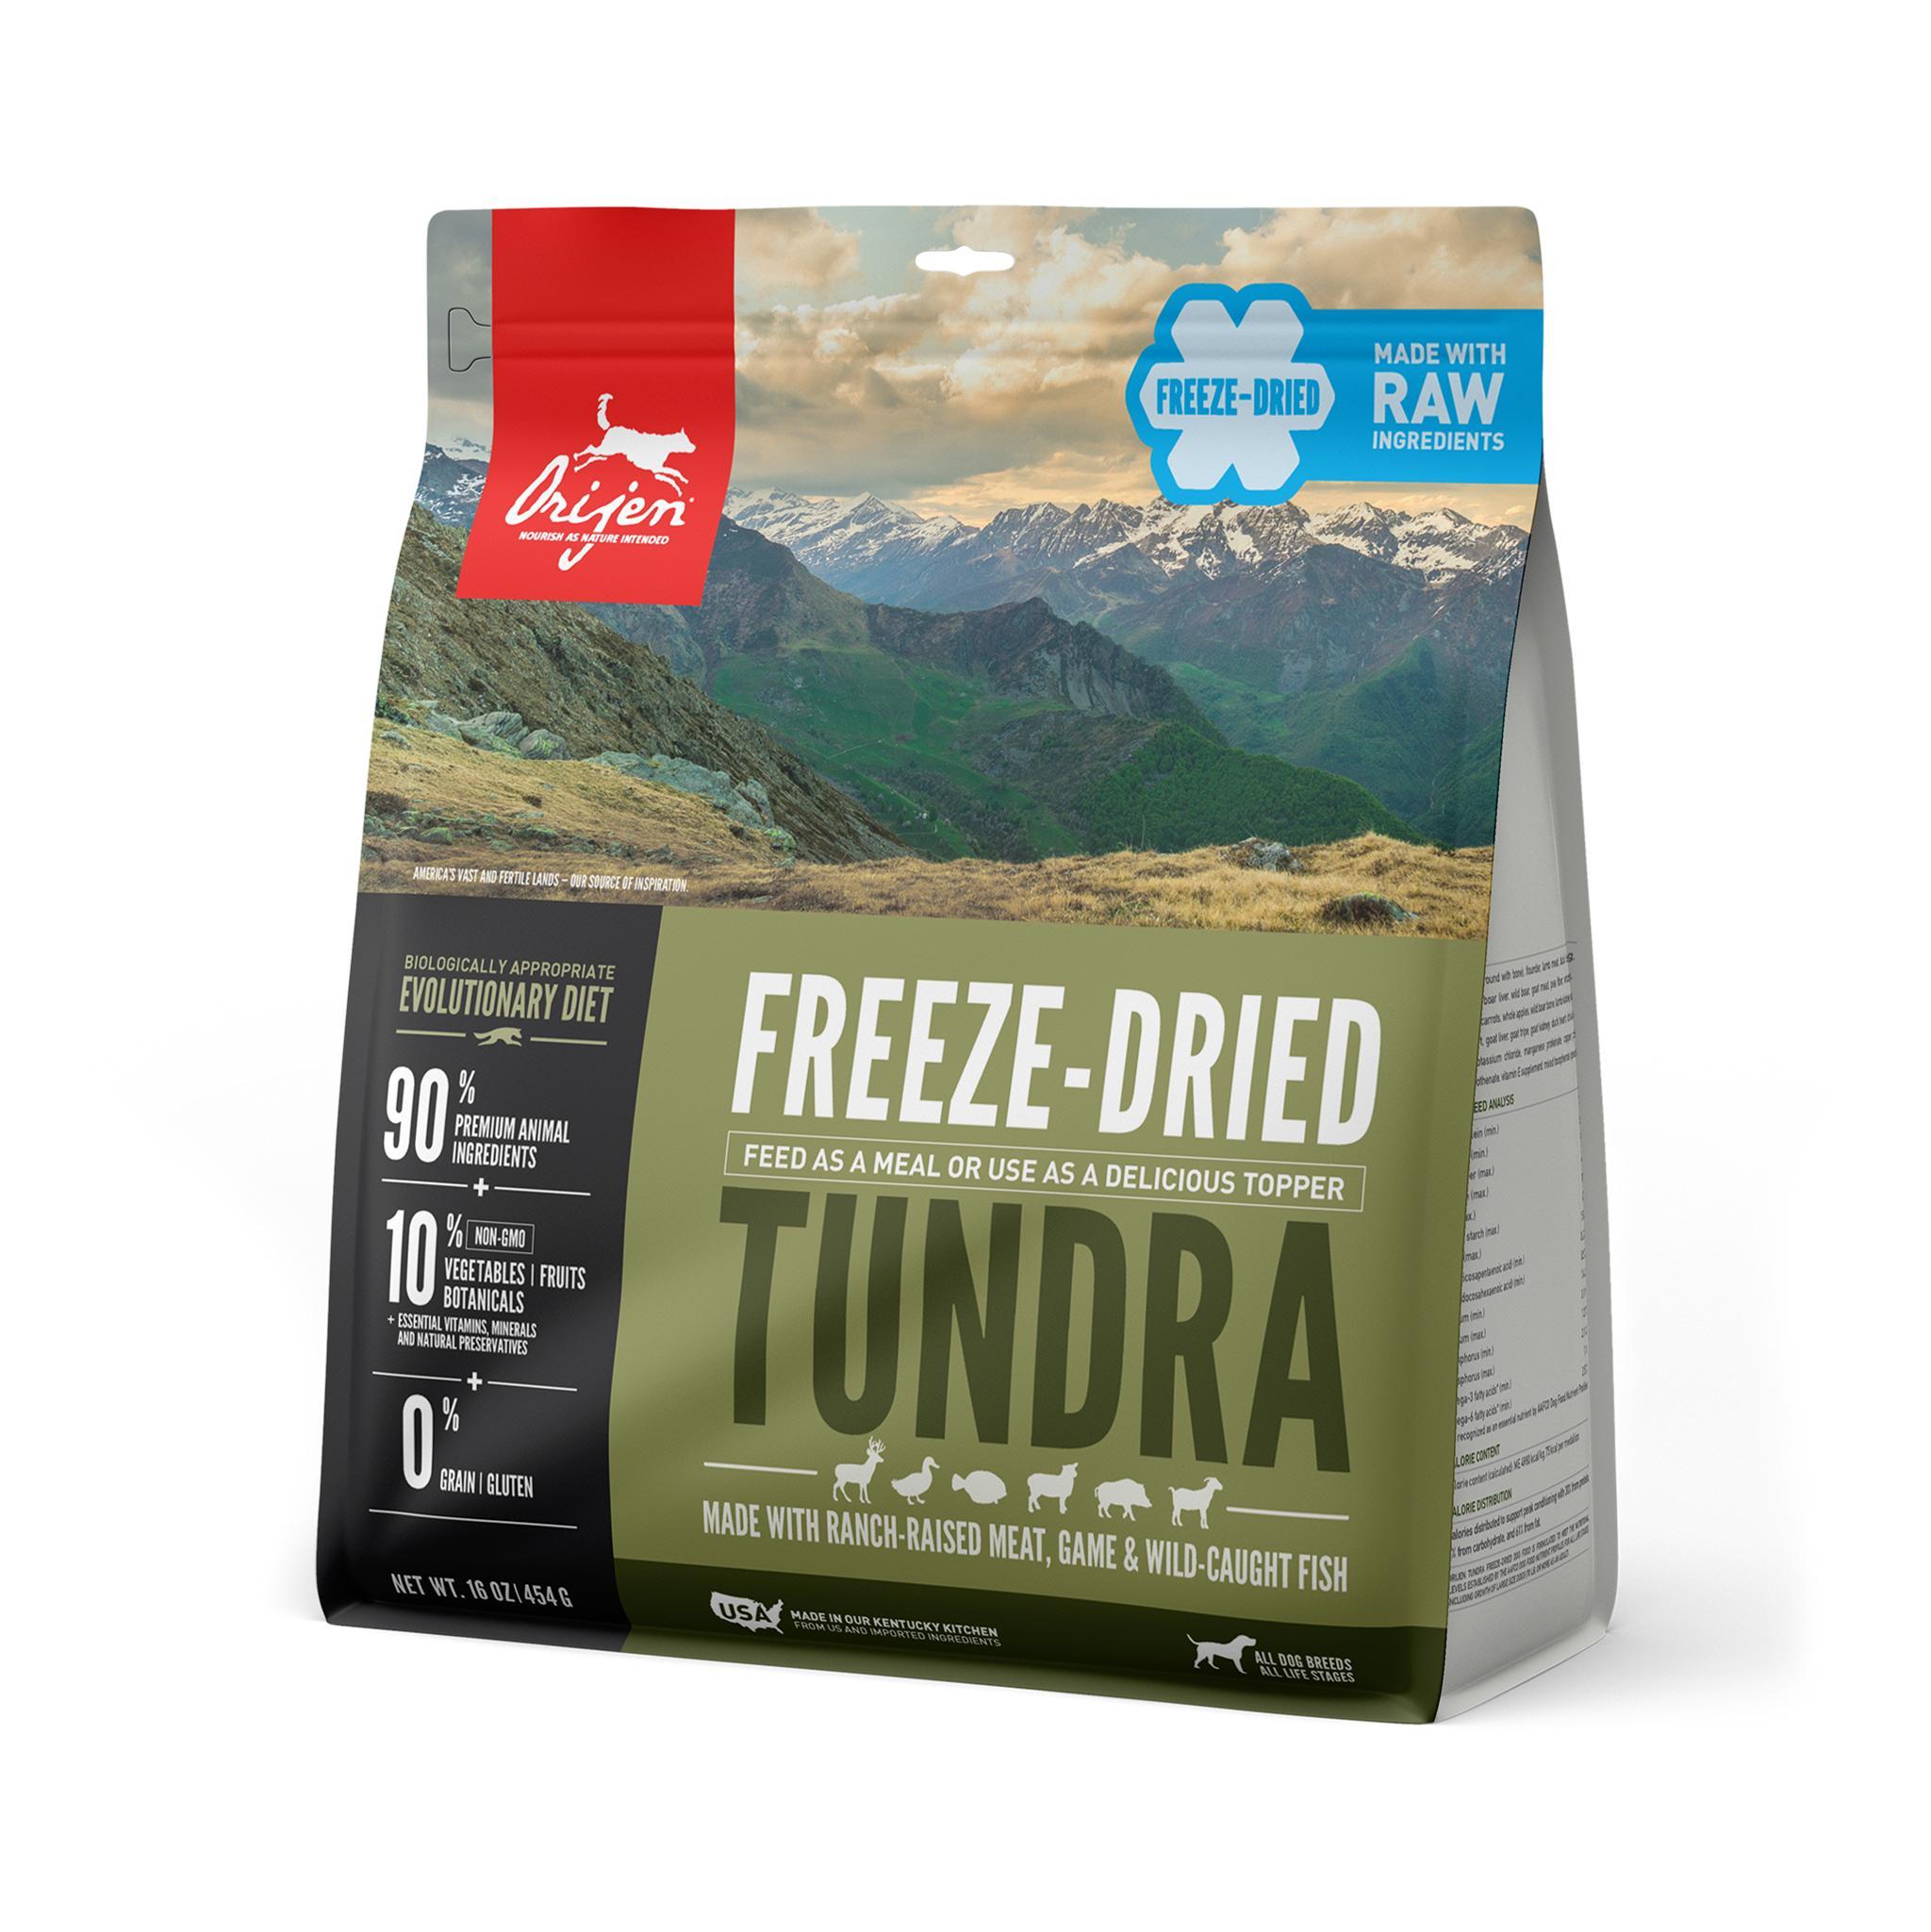 ORIJEN Tundra Grain-Free Freeze-Dried Dog Food, 16-oz